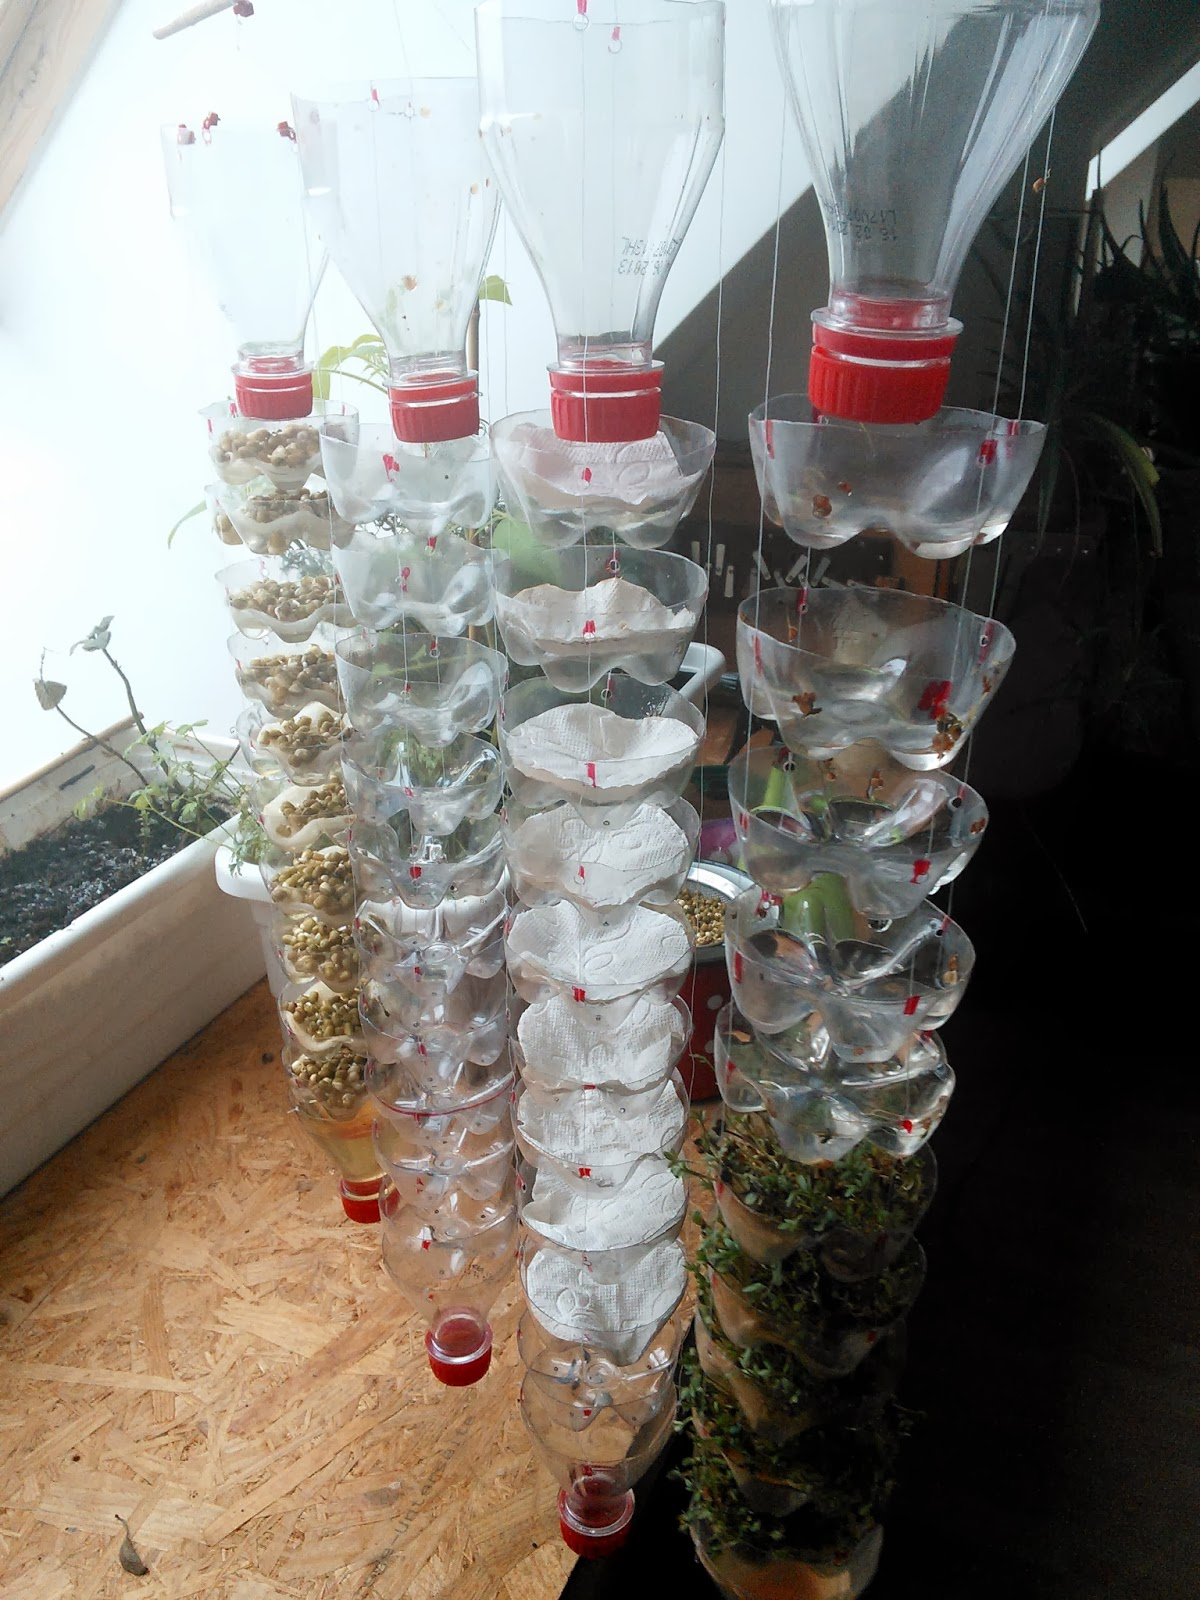 Windrad Basteln Aus Pet Flaschen Diy Pet Flaschen Interesting